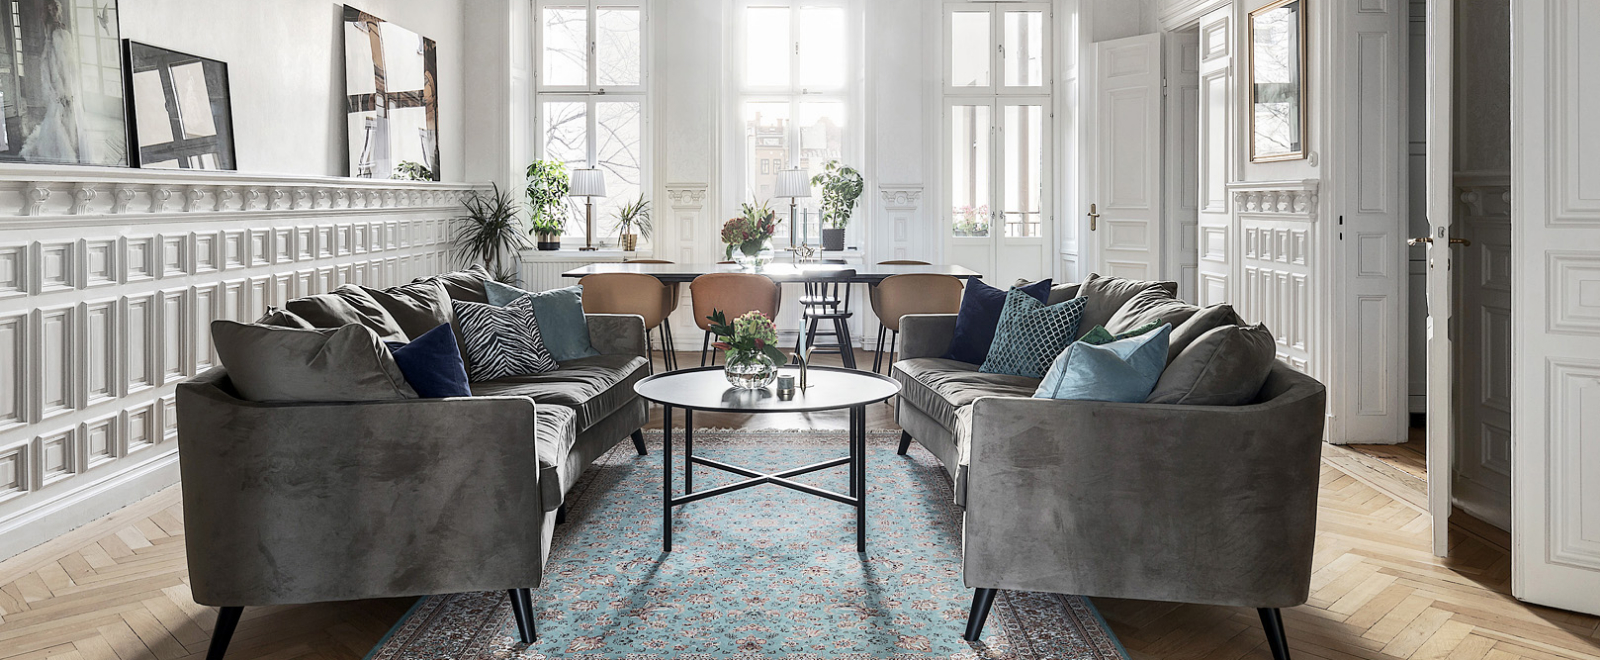 Harmonisk designat matsal/ lounge efter renovering, design av @koolistyle.